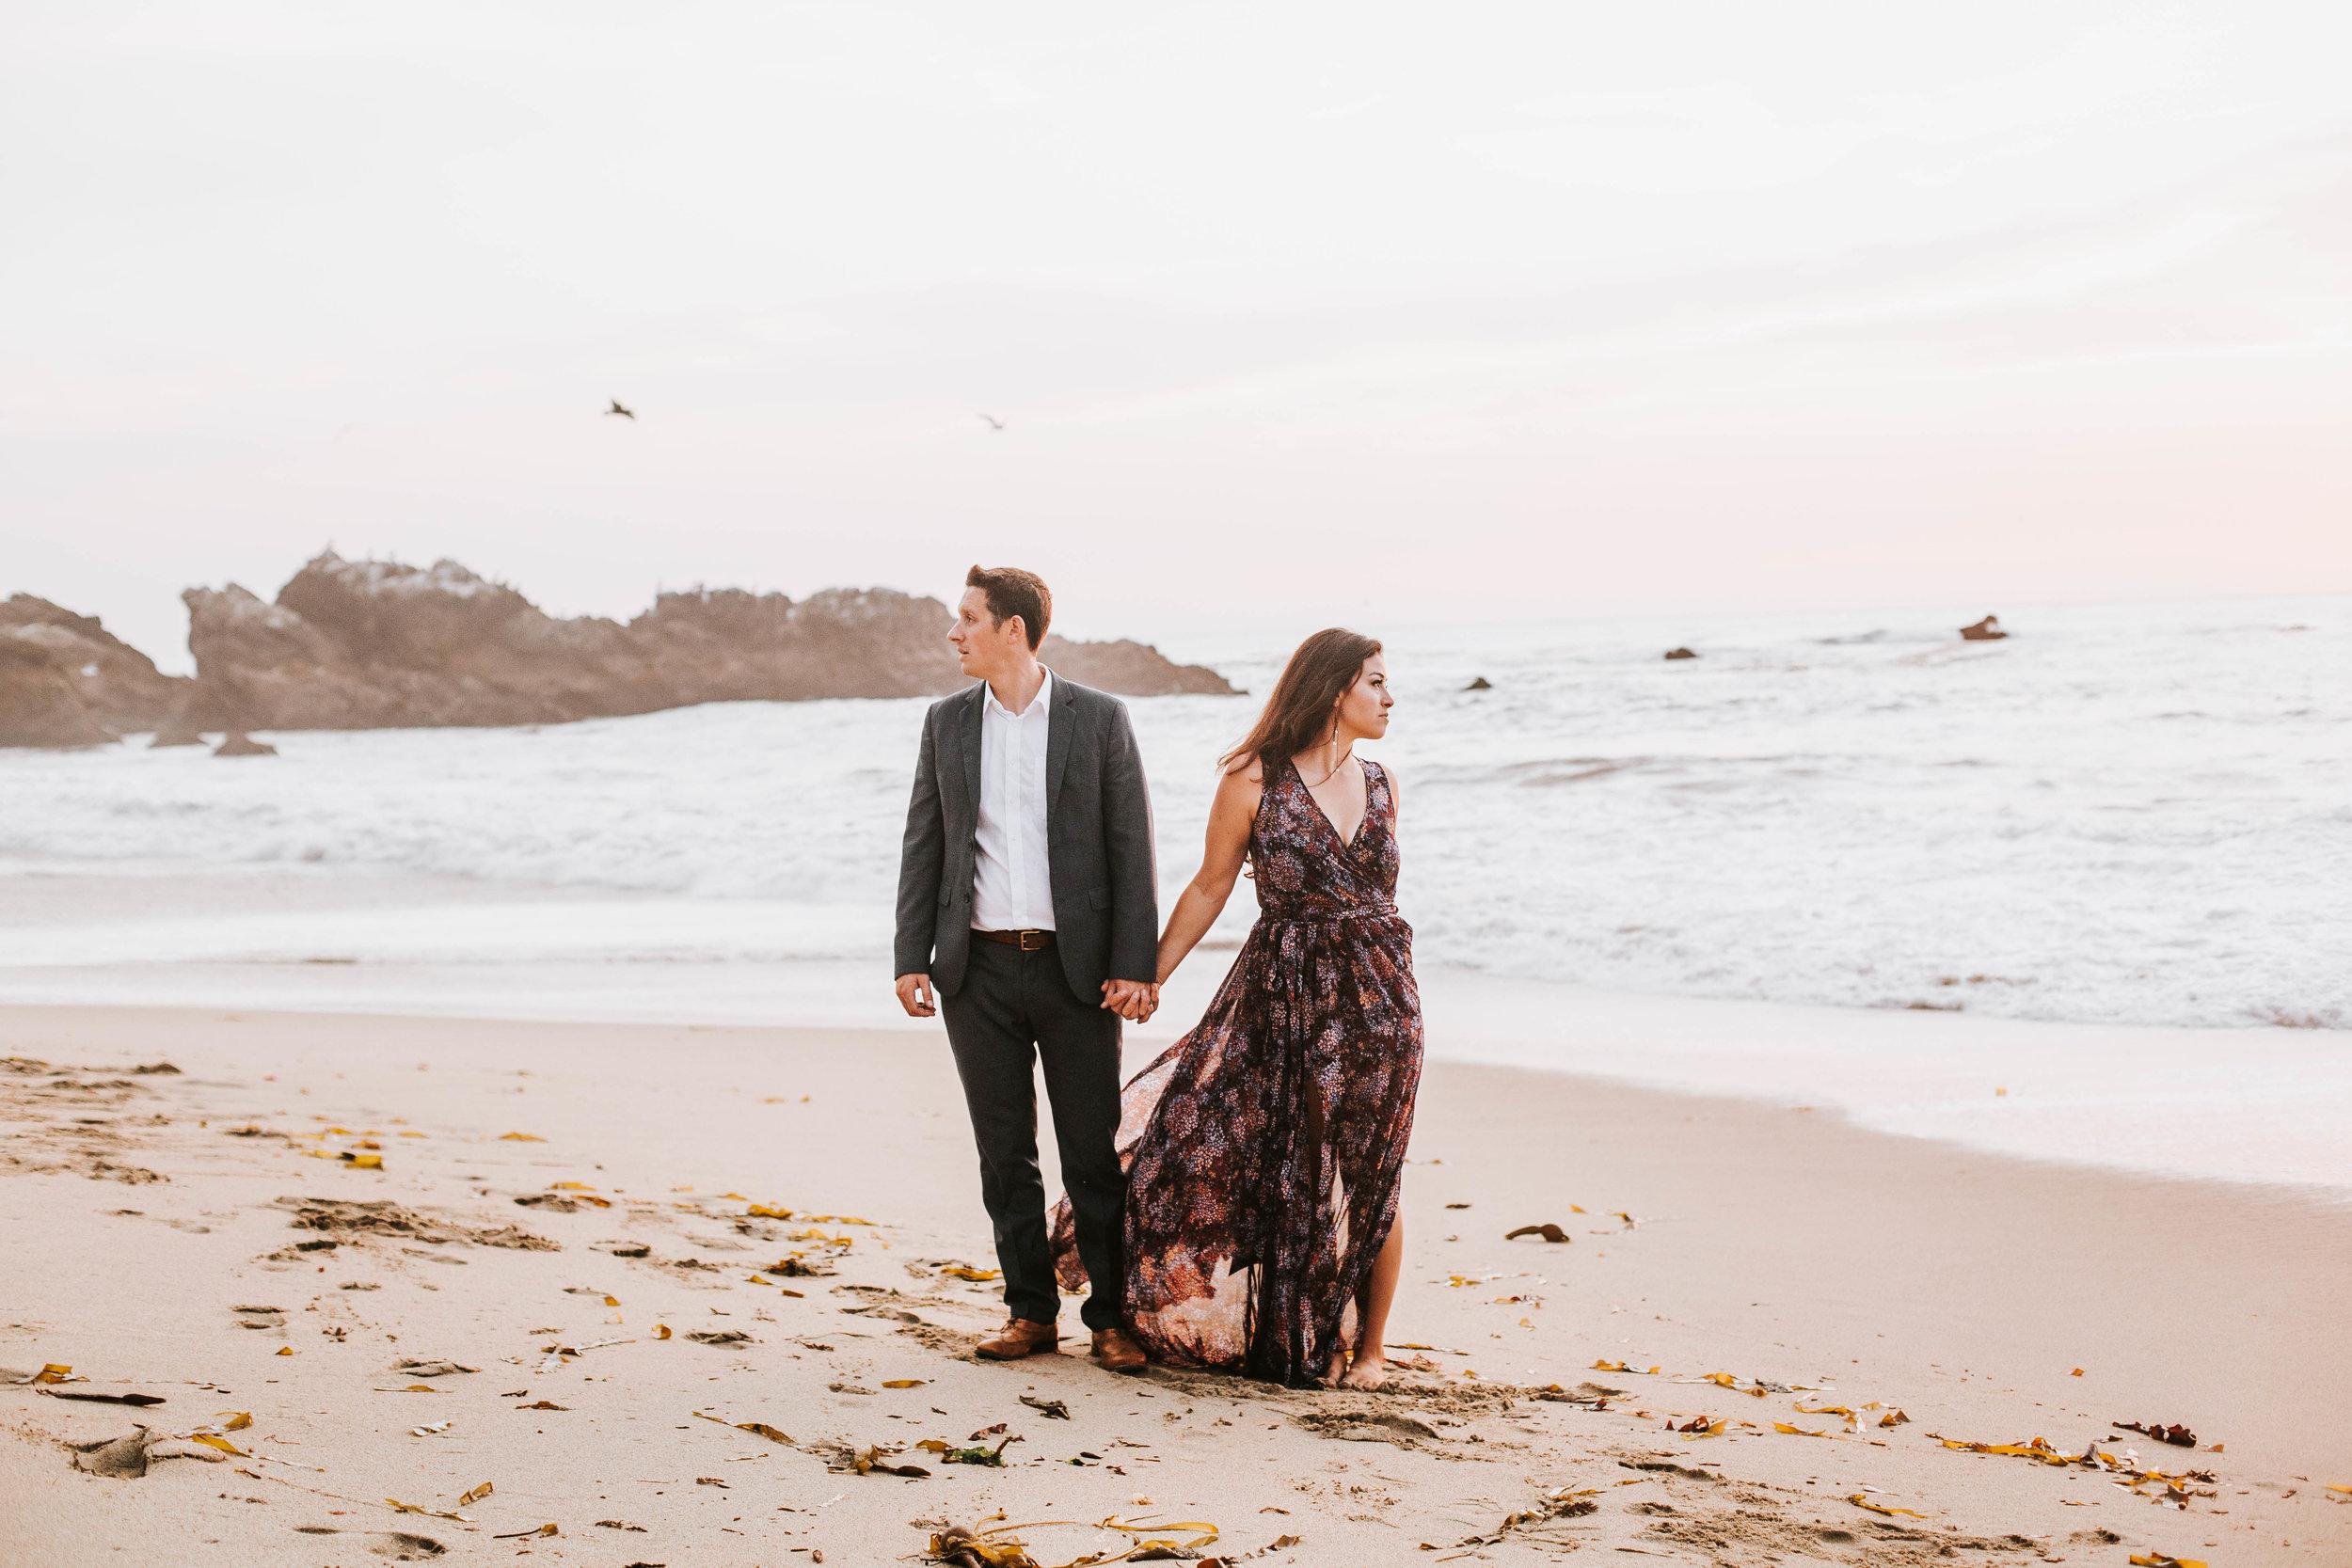 nicole-daacke-photography-big-sur-california-coast-adventure-engagement-photos-adventurous-elopement-intimate-wedding-photographer-golden-coastal-cali-engagement-session-26.jpg